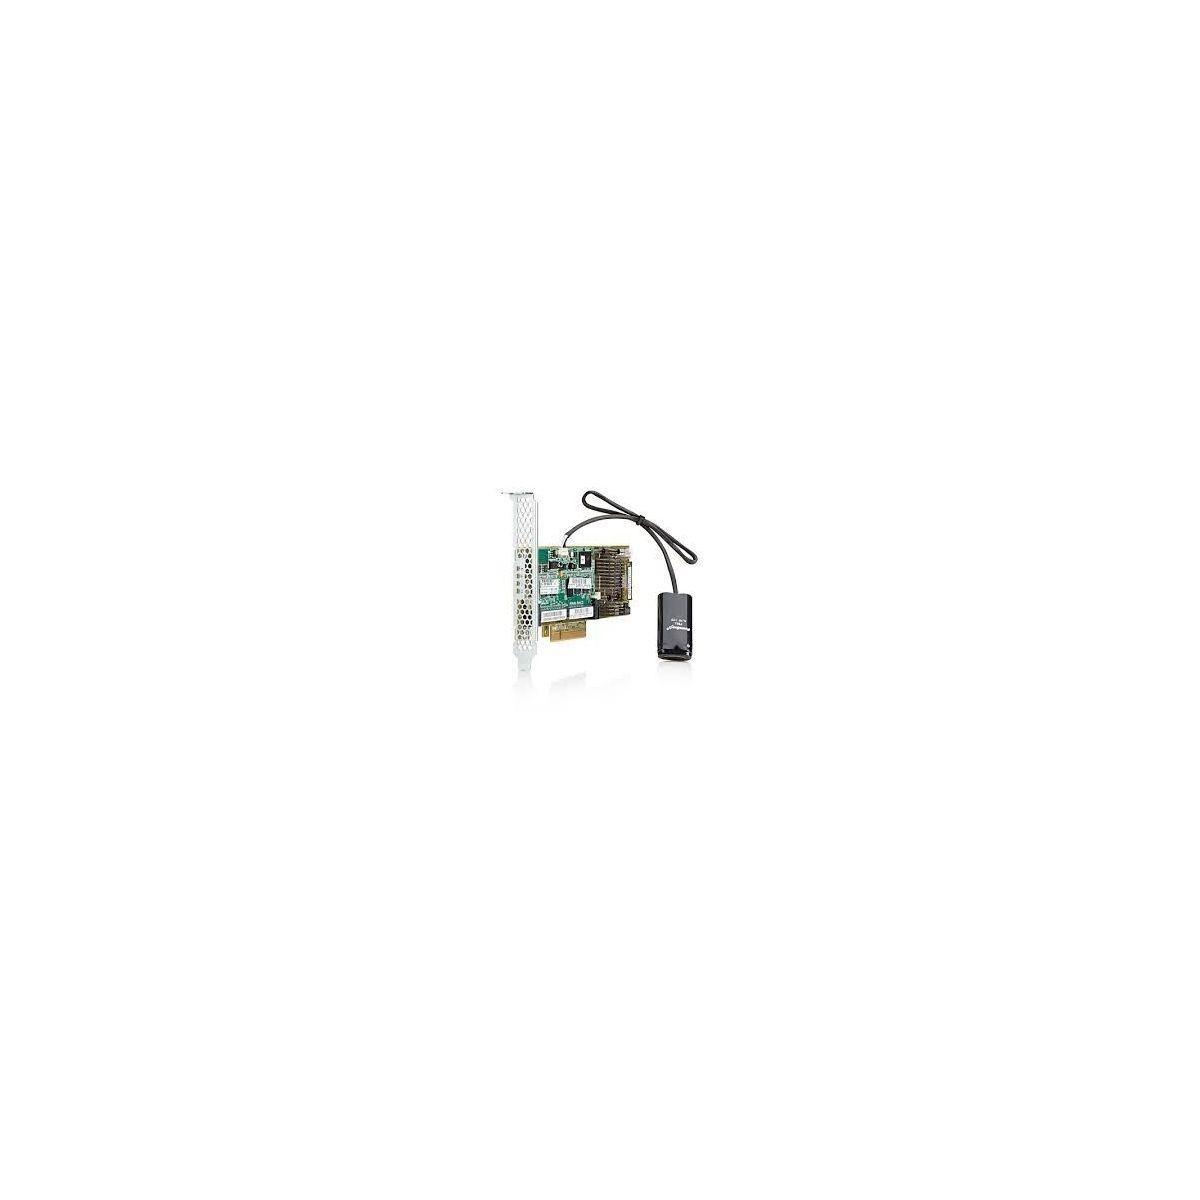 HP Smart Array P420, 1GB FBWC, High-Profile - 1 - Raid Controller - 267,75lei